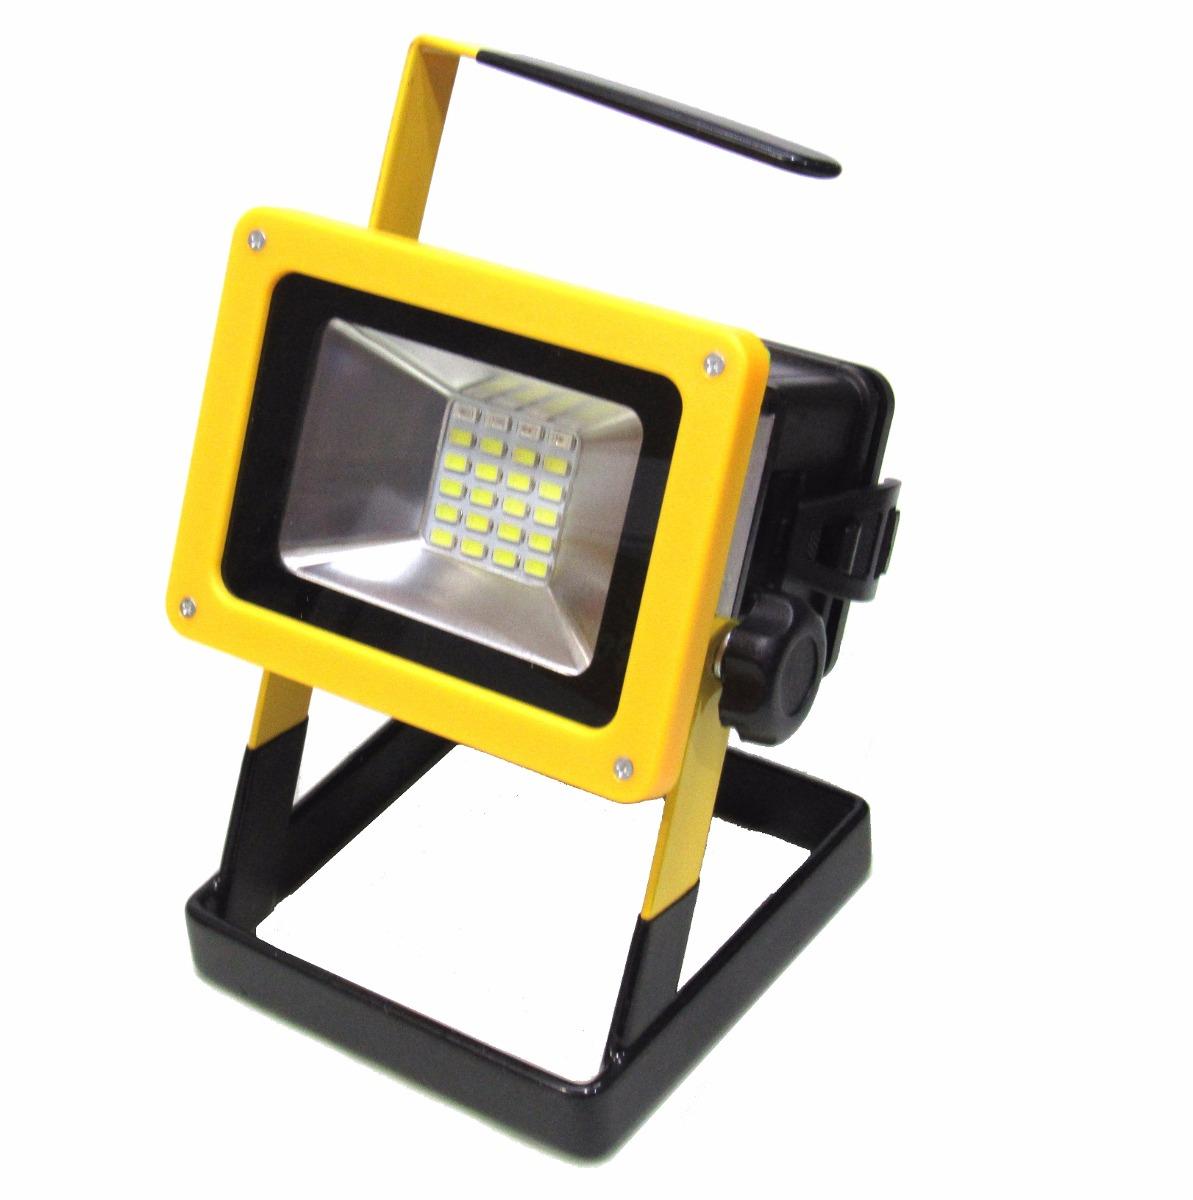 foco led portatil recargable 30w emergencia fernapet